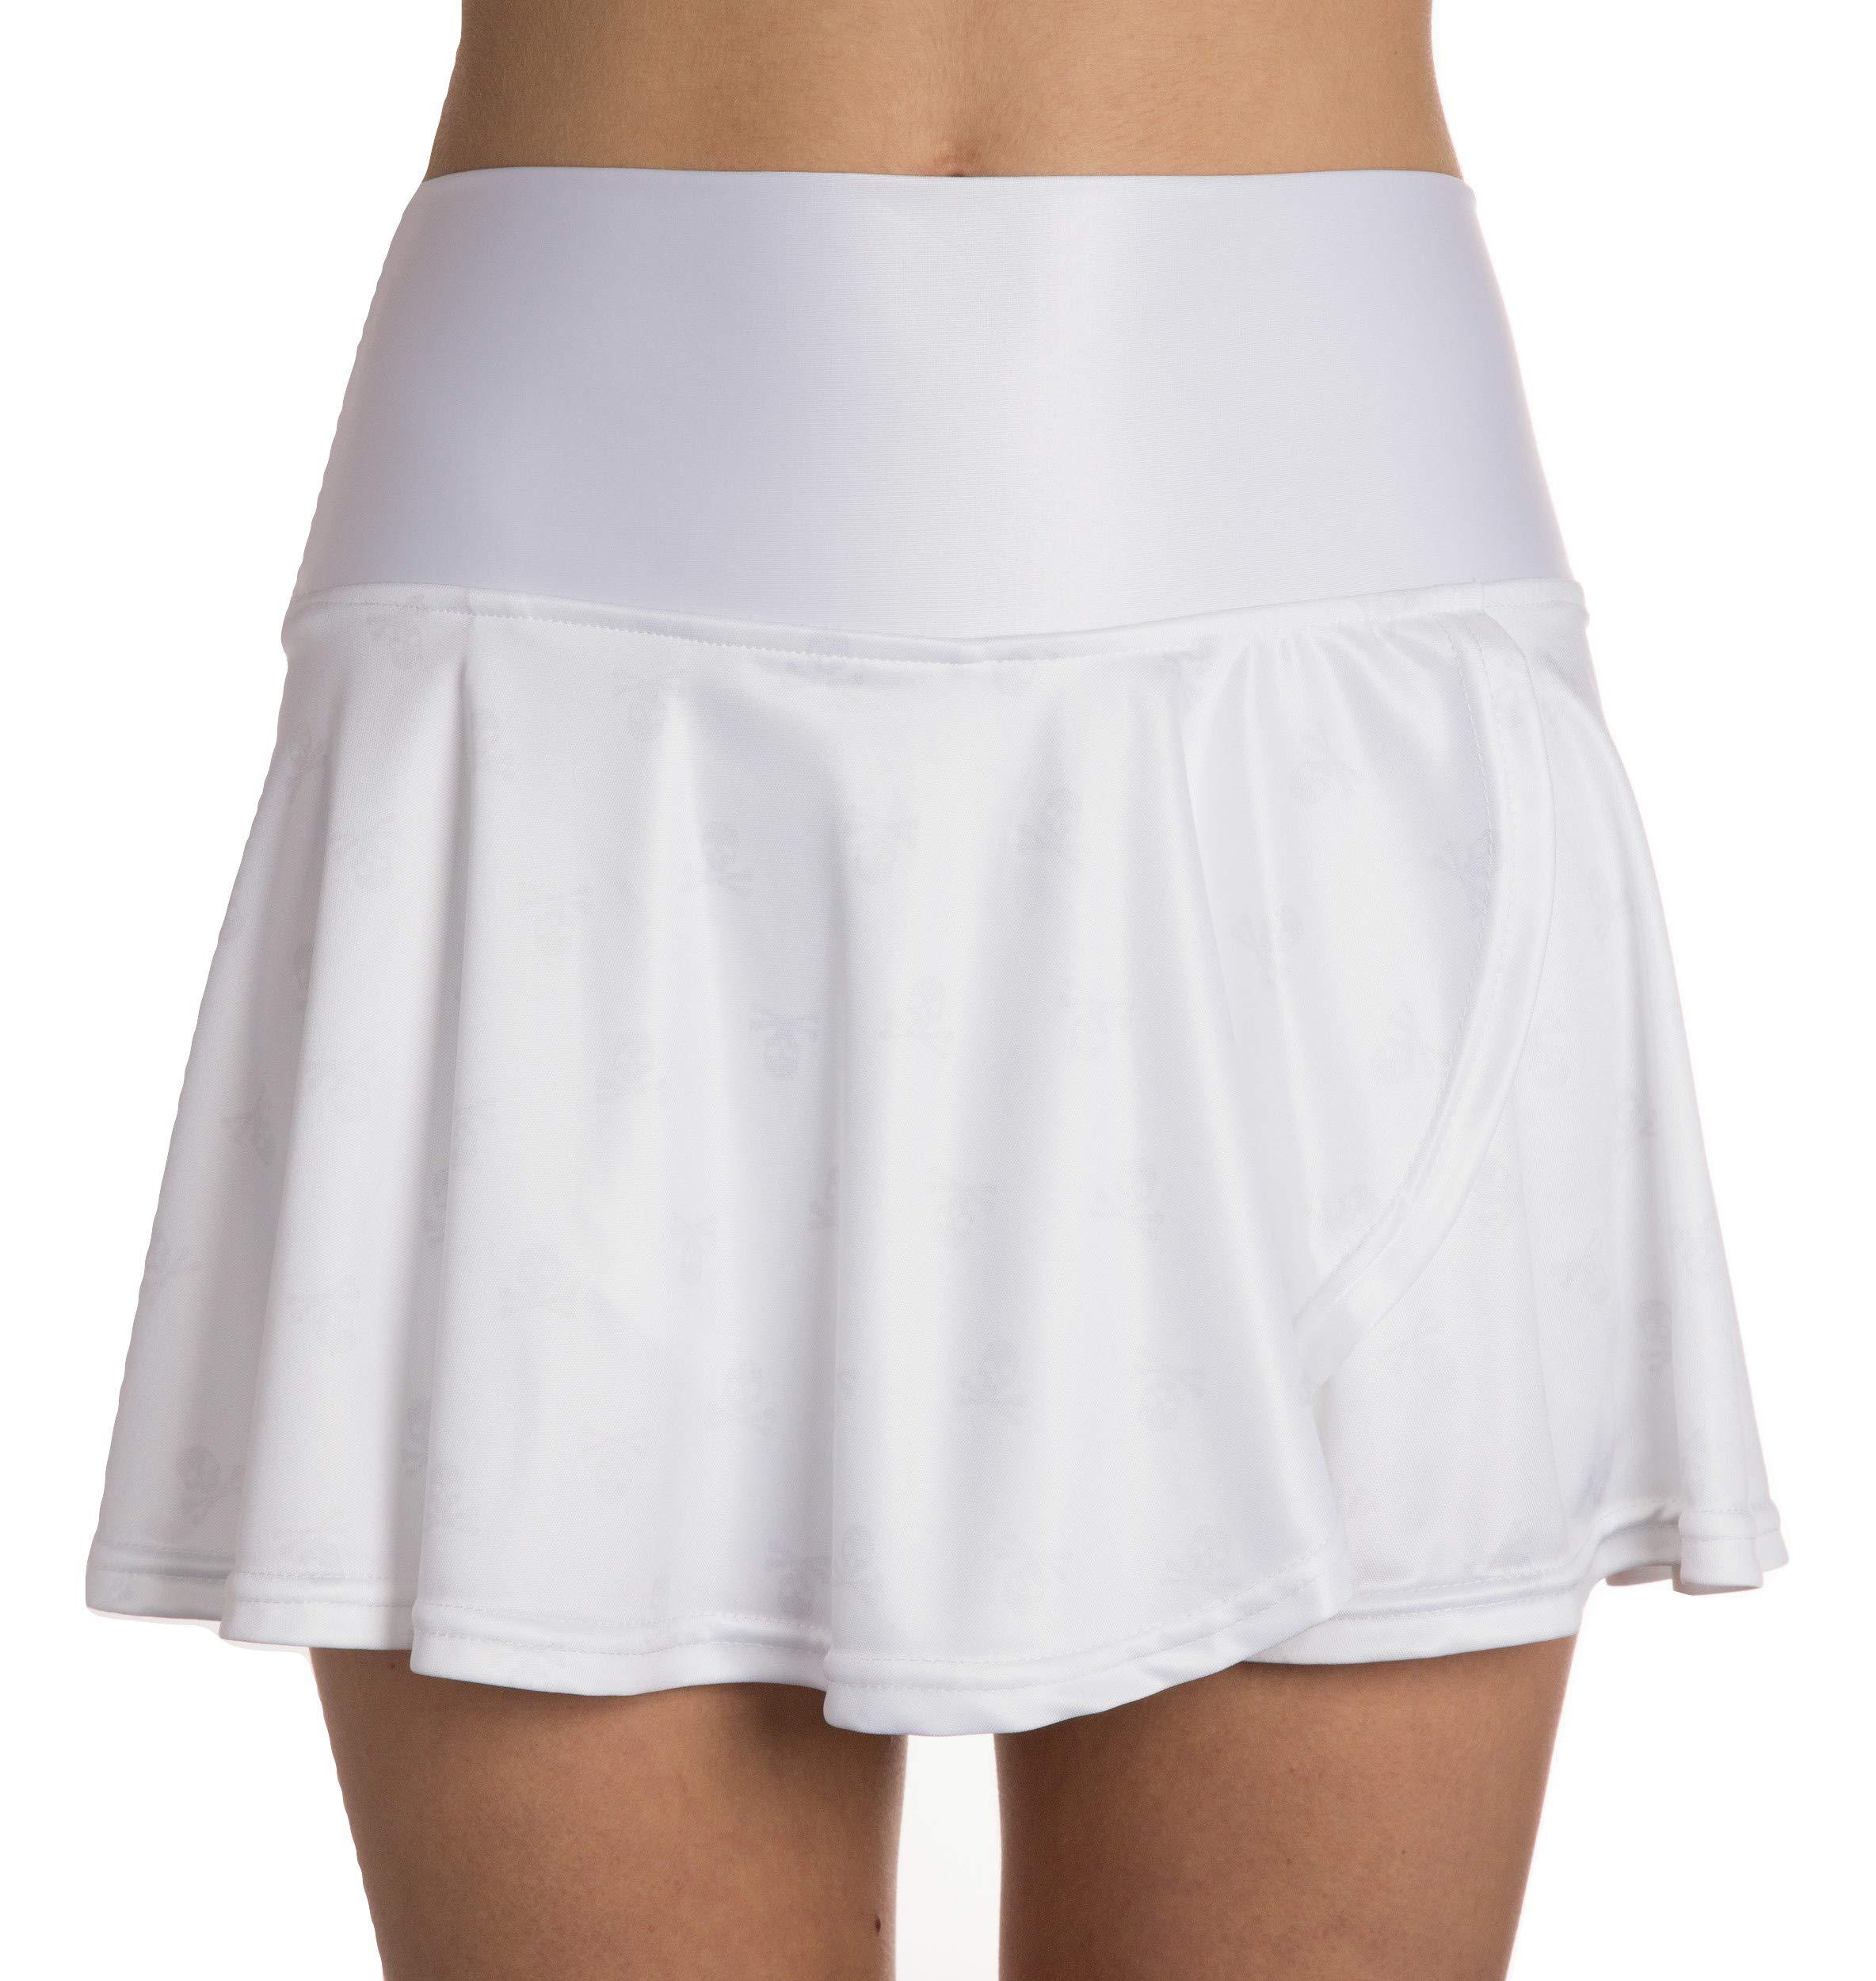 Faye+Florie Holly Tennis Skirt (Camo, X-Small)